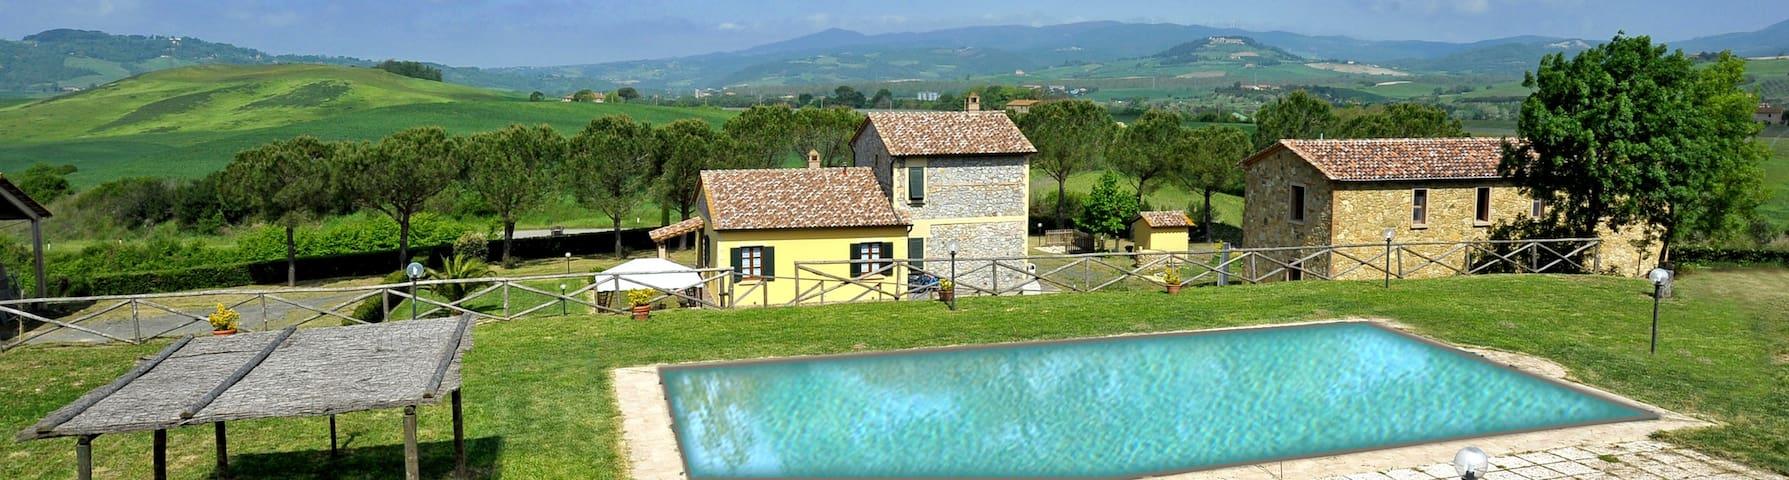 Agriturismo Santa Chiara Appartamento con piscina